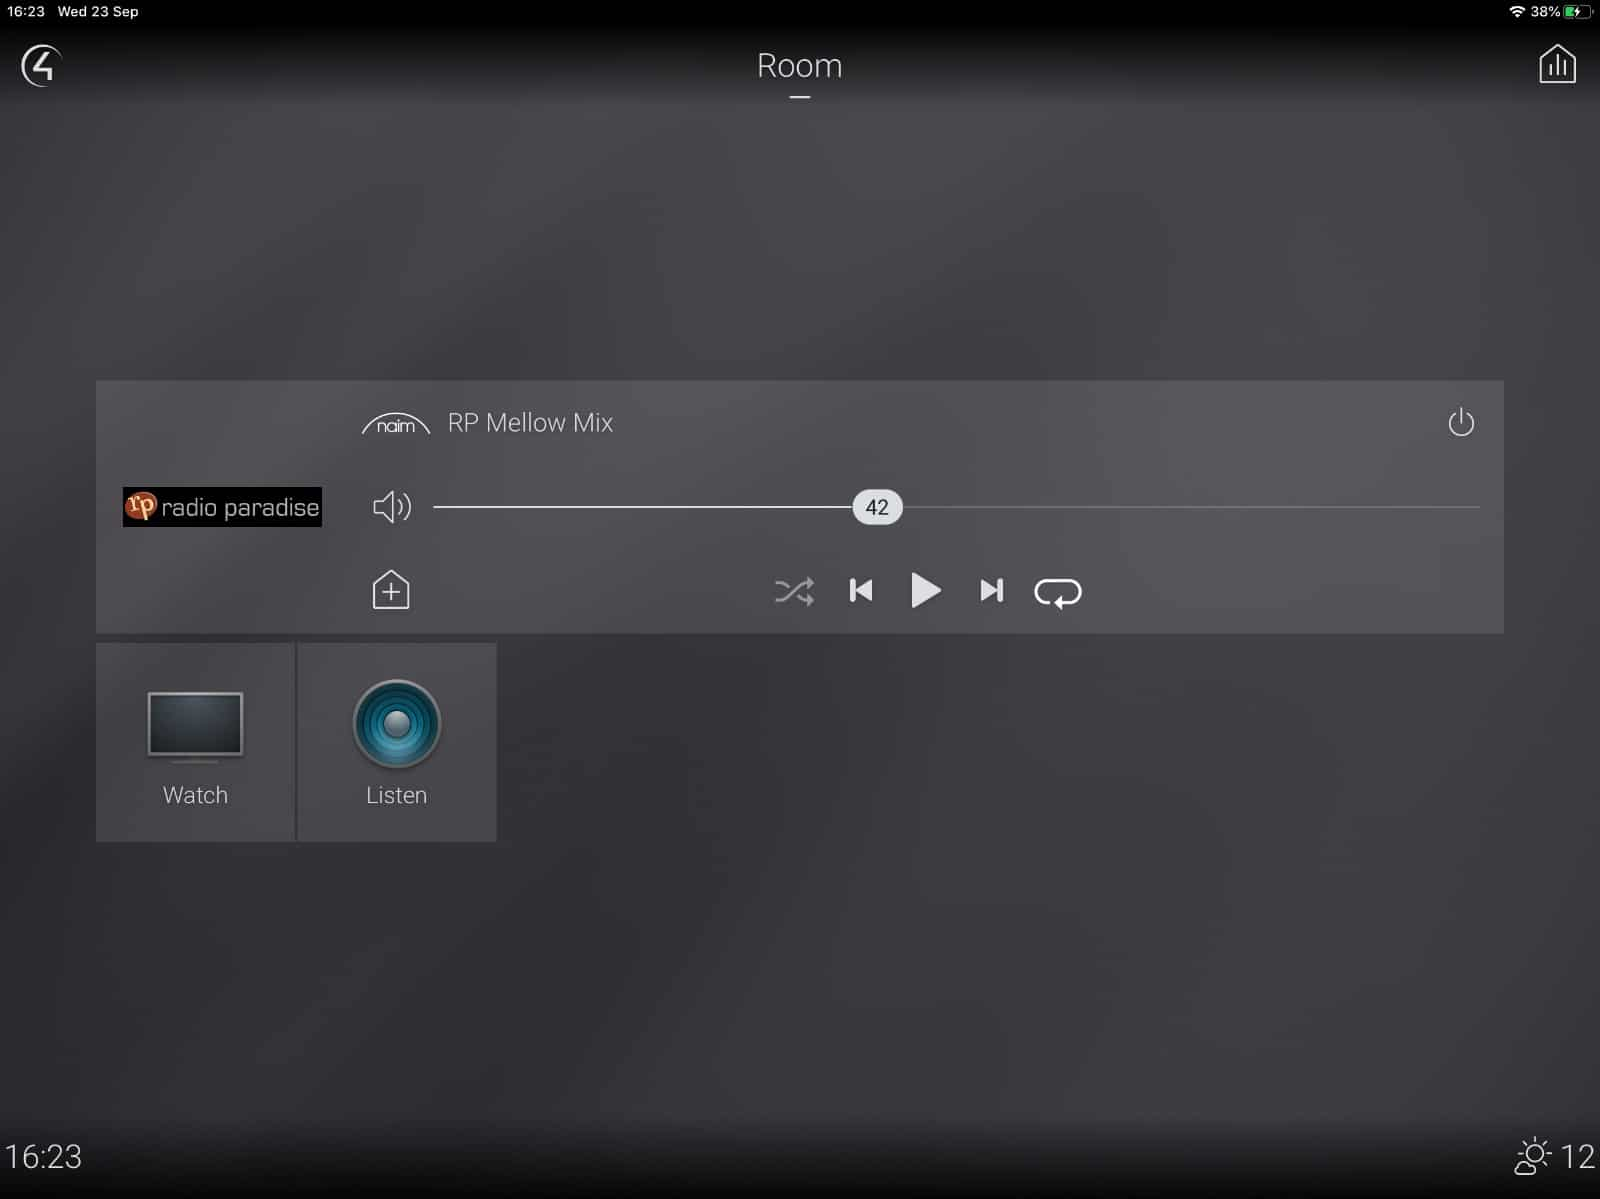 Control4 Naim Interface: Control